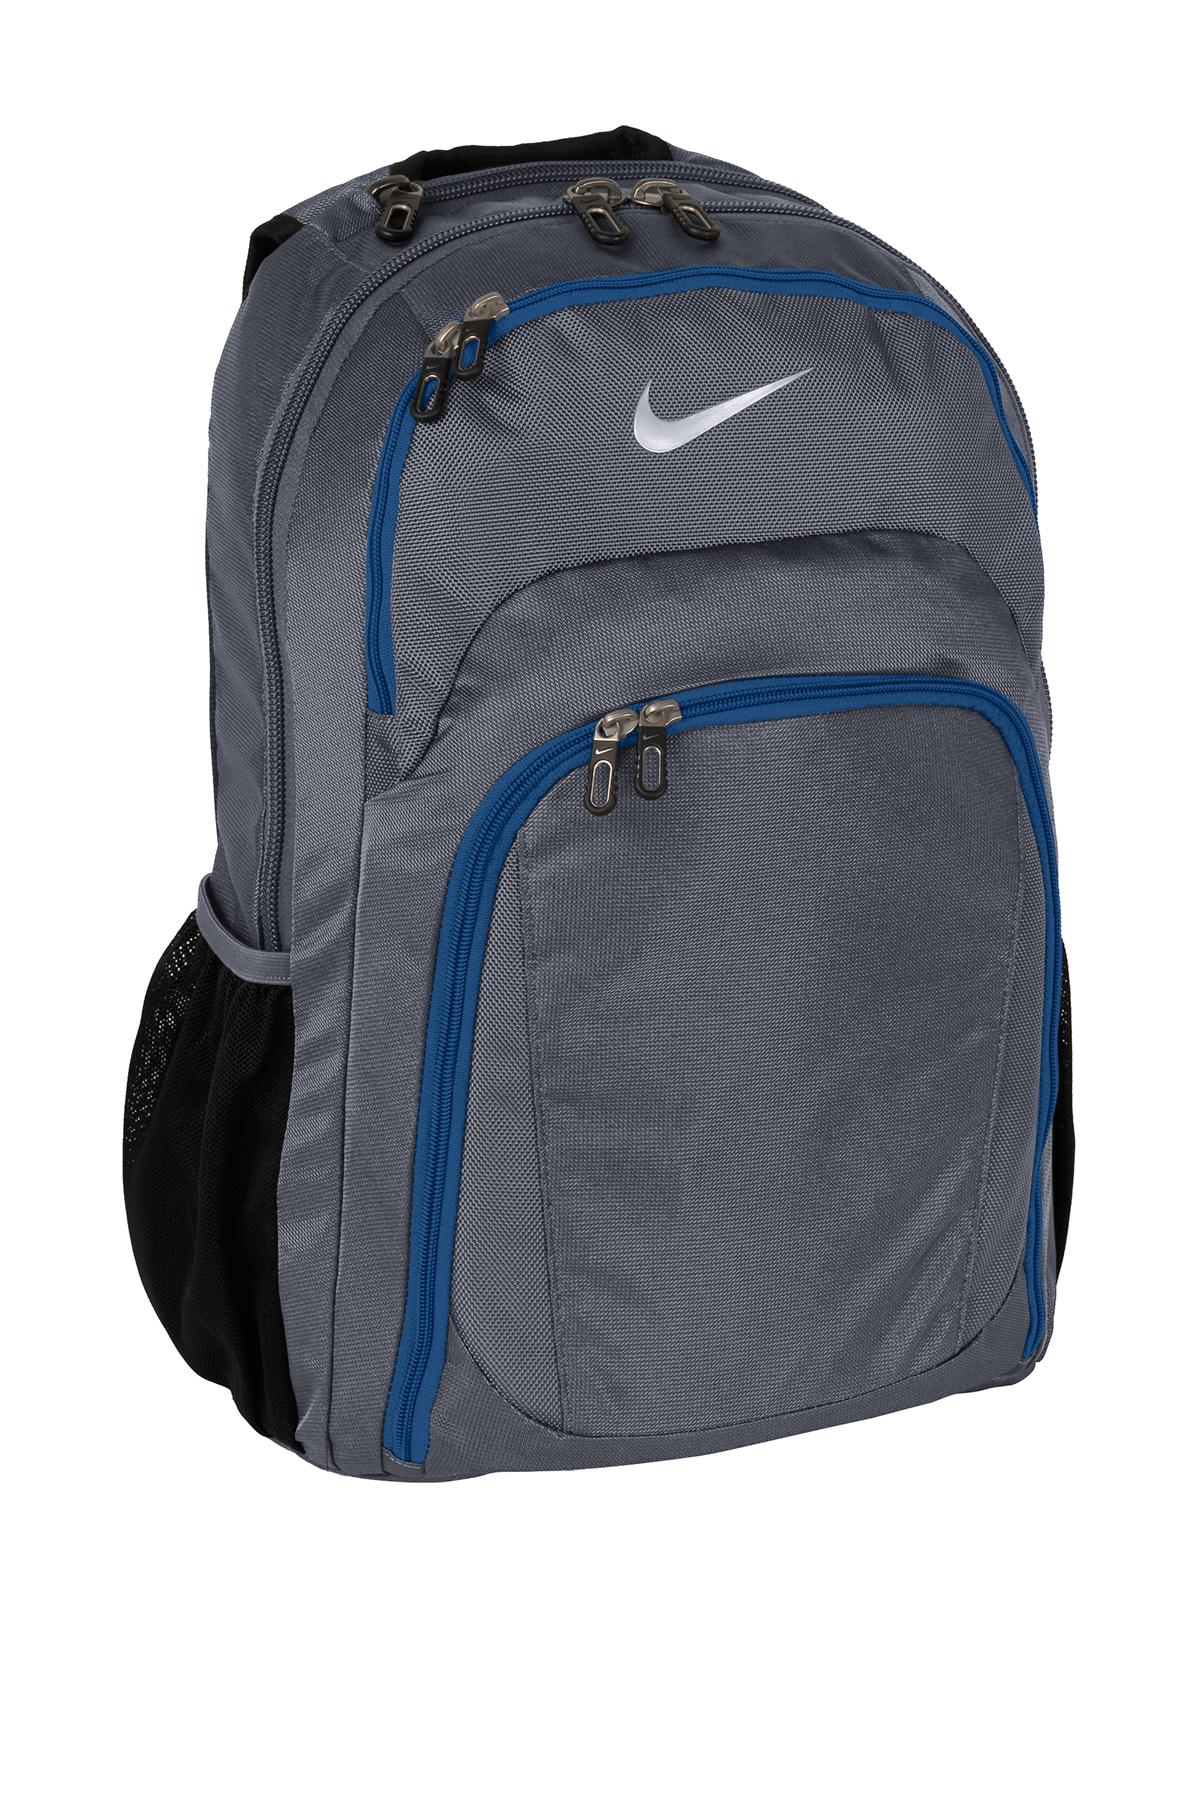 nike performance backpack backpacks bags sanmar rh sanmar com Library Book Bag Clip Art Lunch Box Clip Art